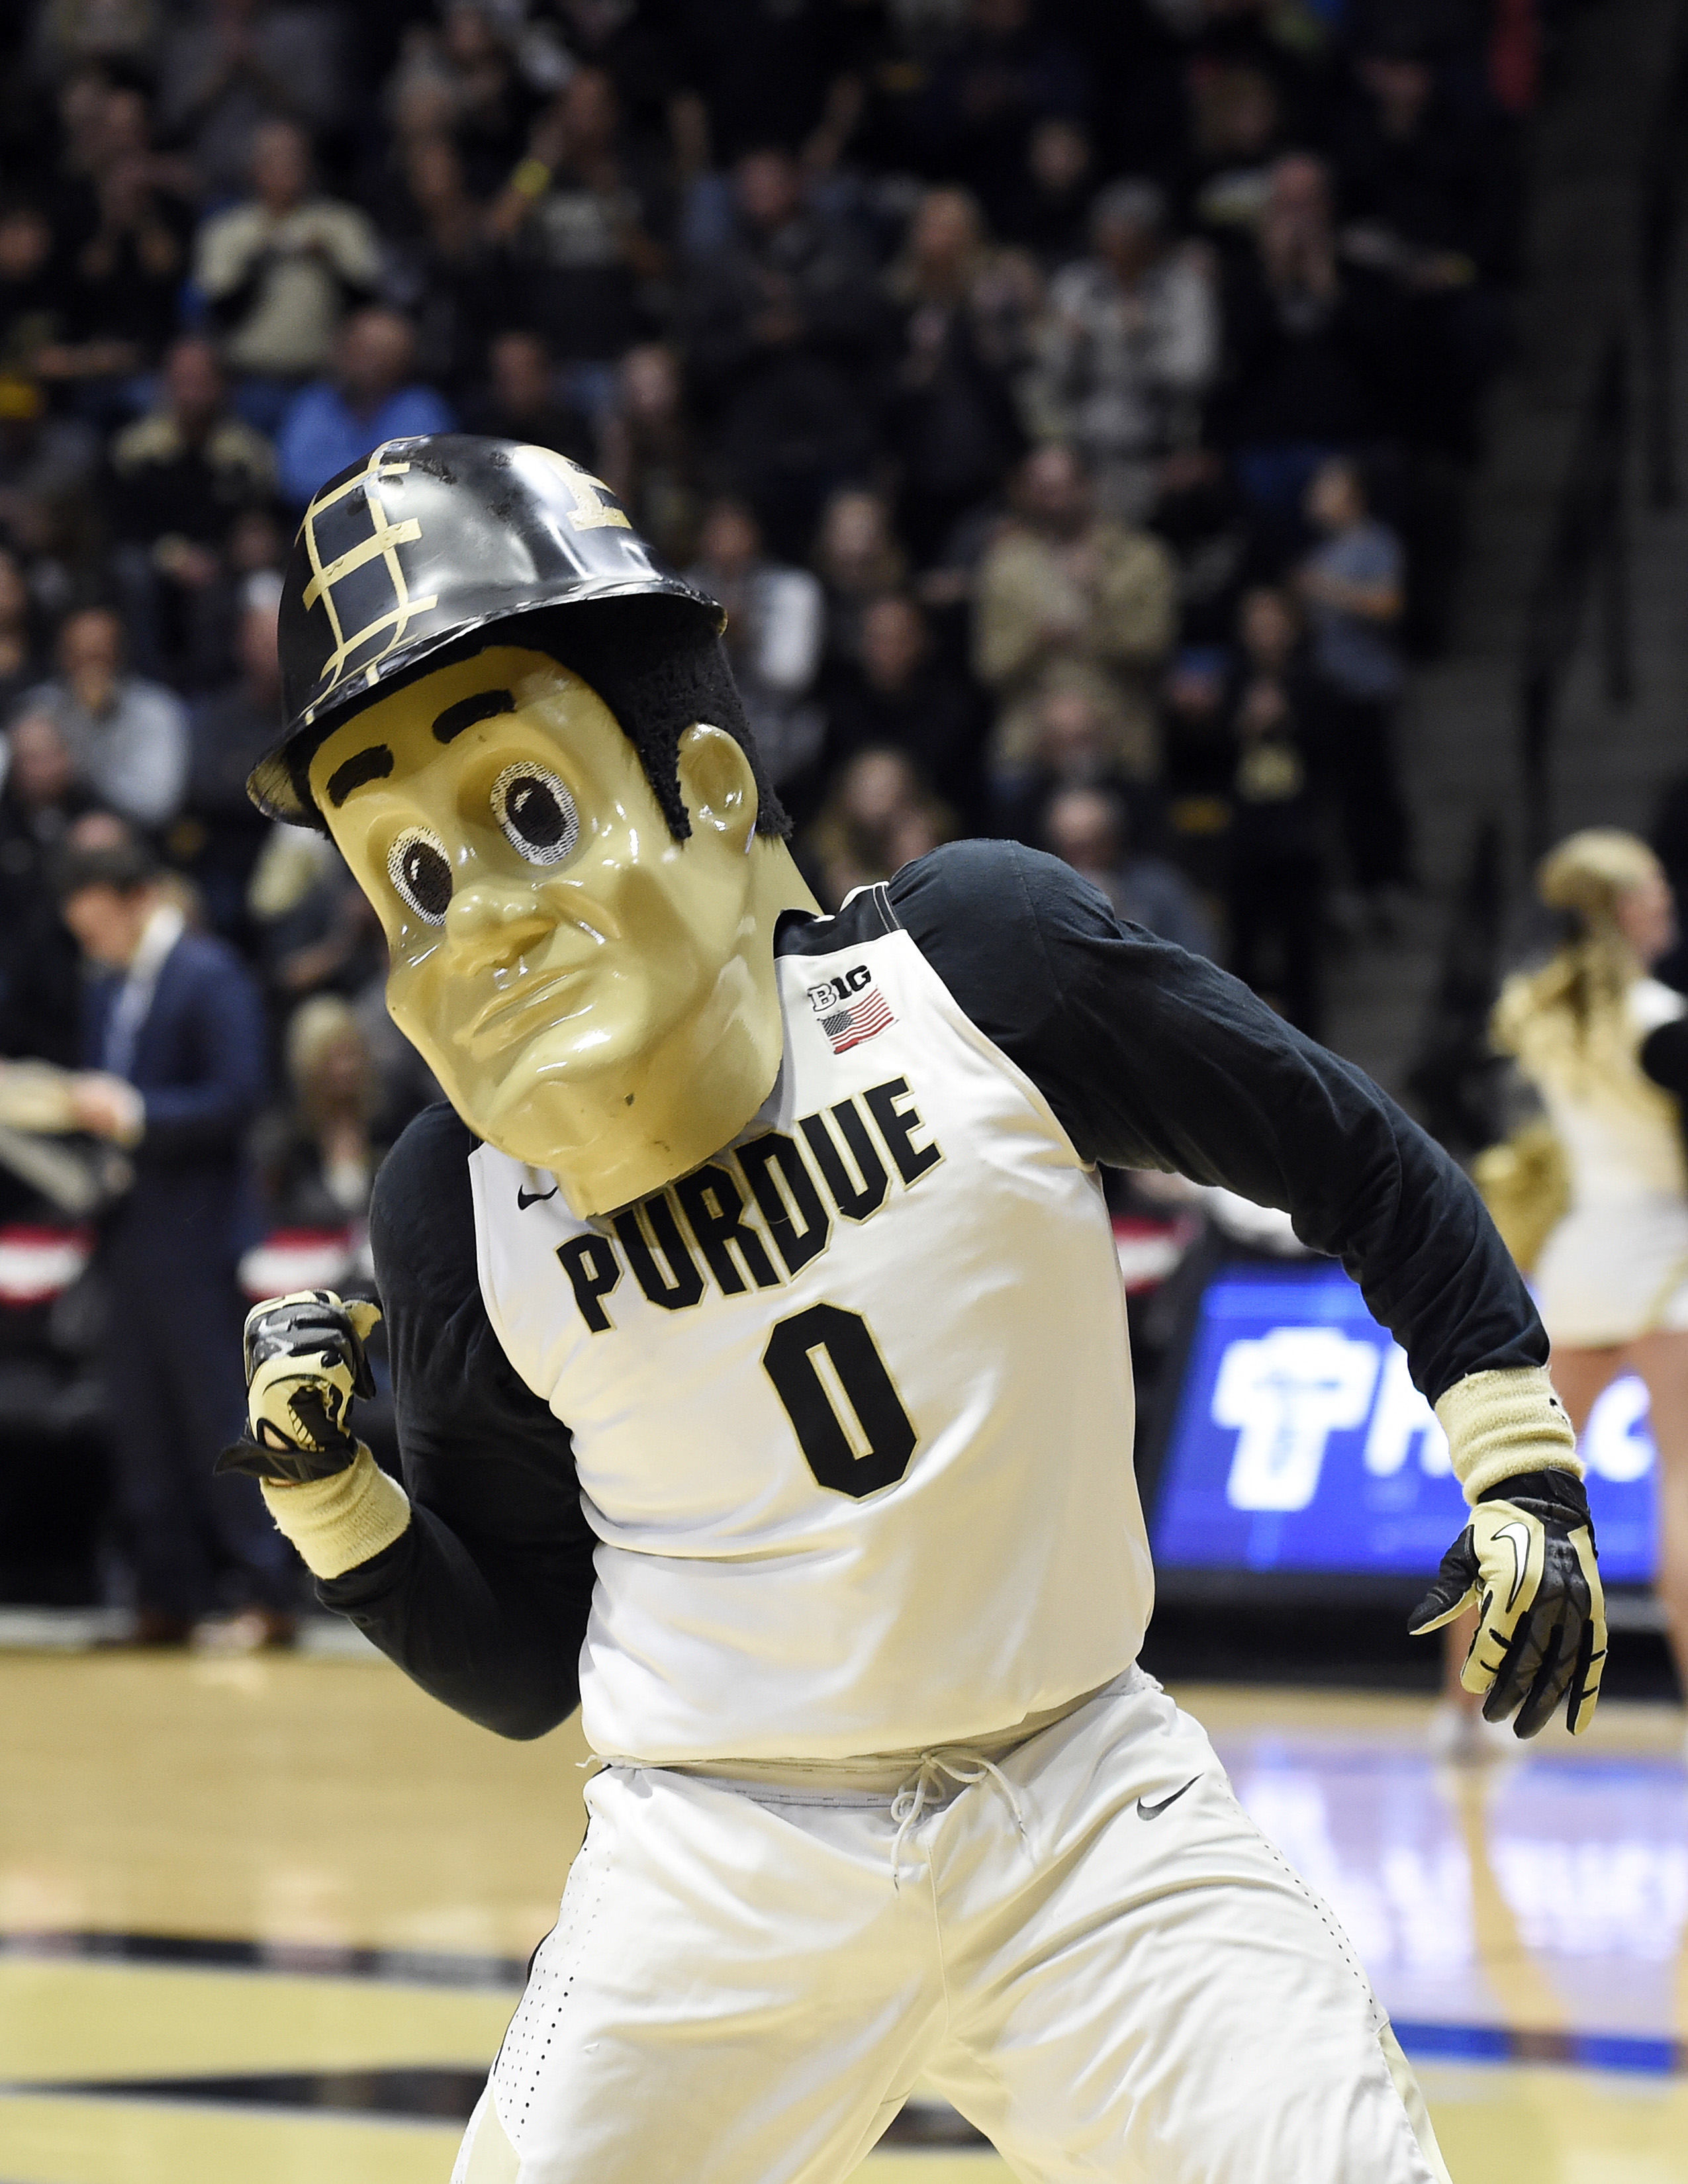 NCAA Basketball: SIU - Edwardsville at Purdue